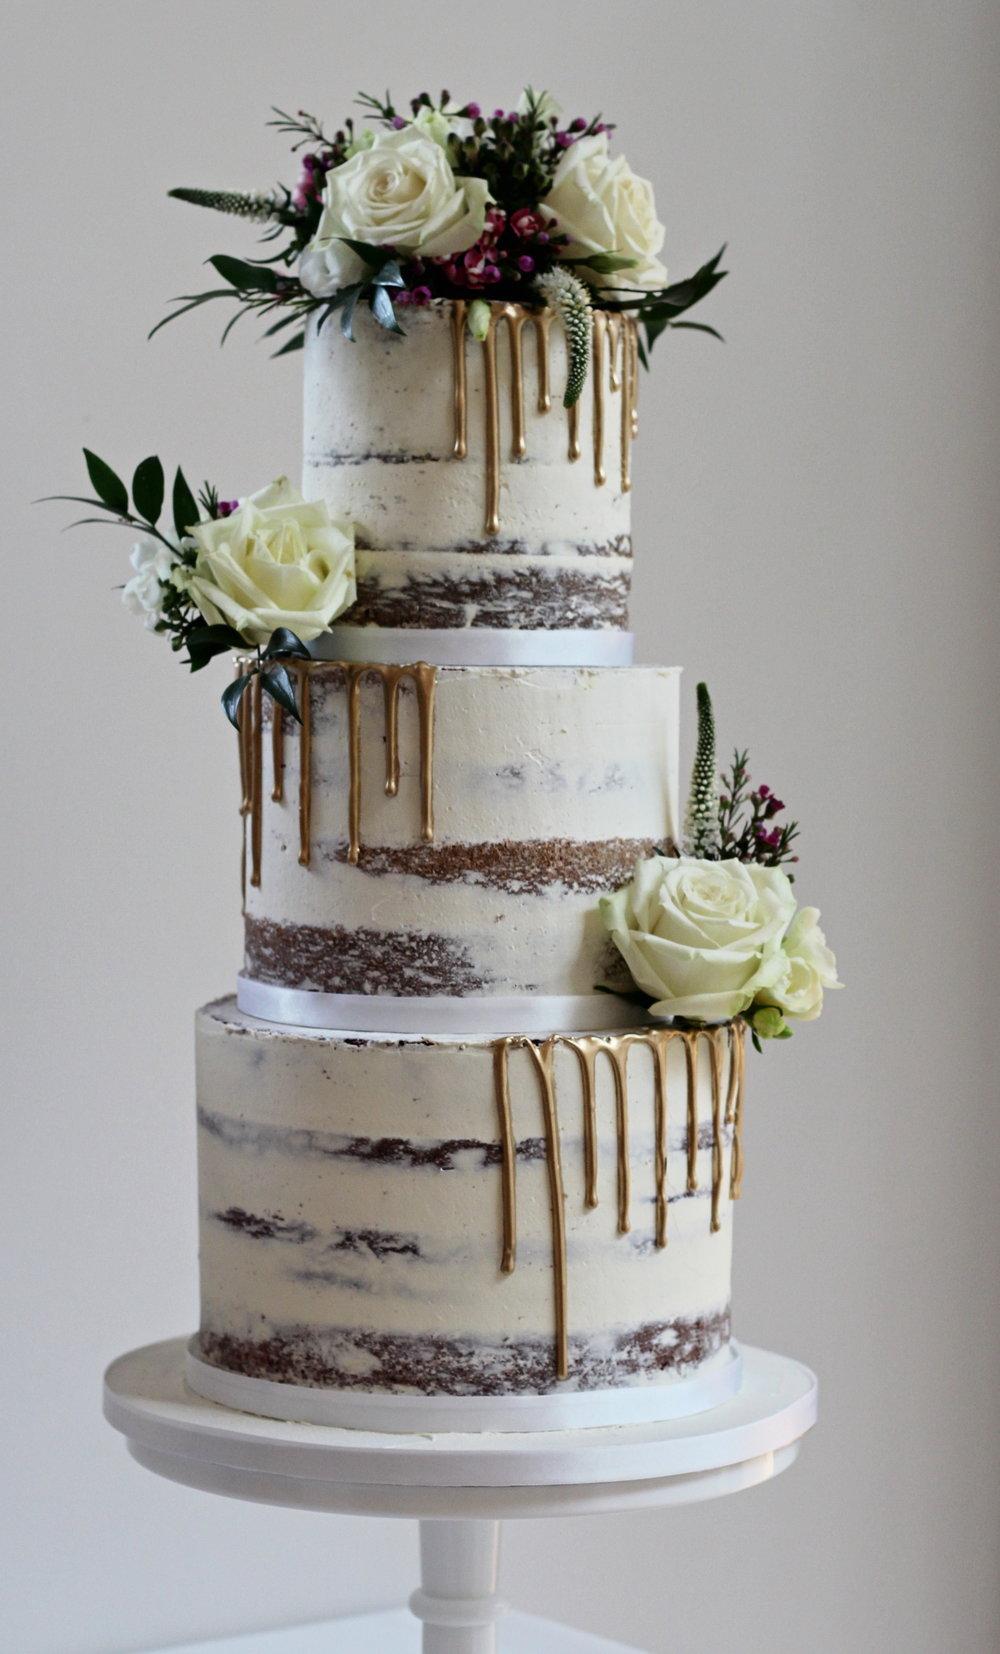 Naked Ombre Wedding Cake - The Cakery Leamington Spa